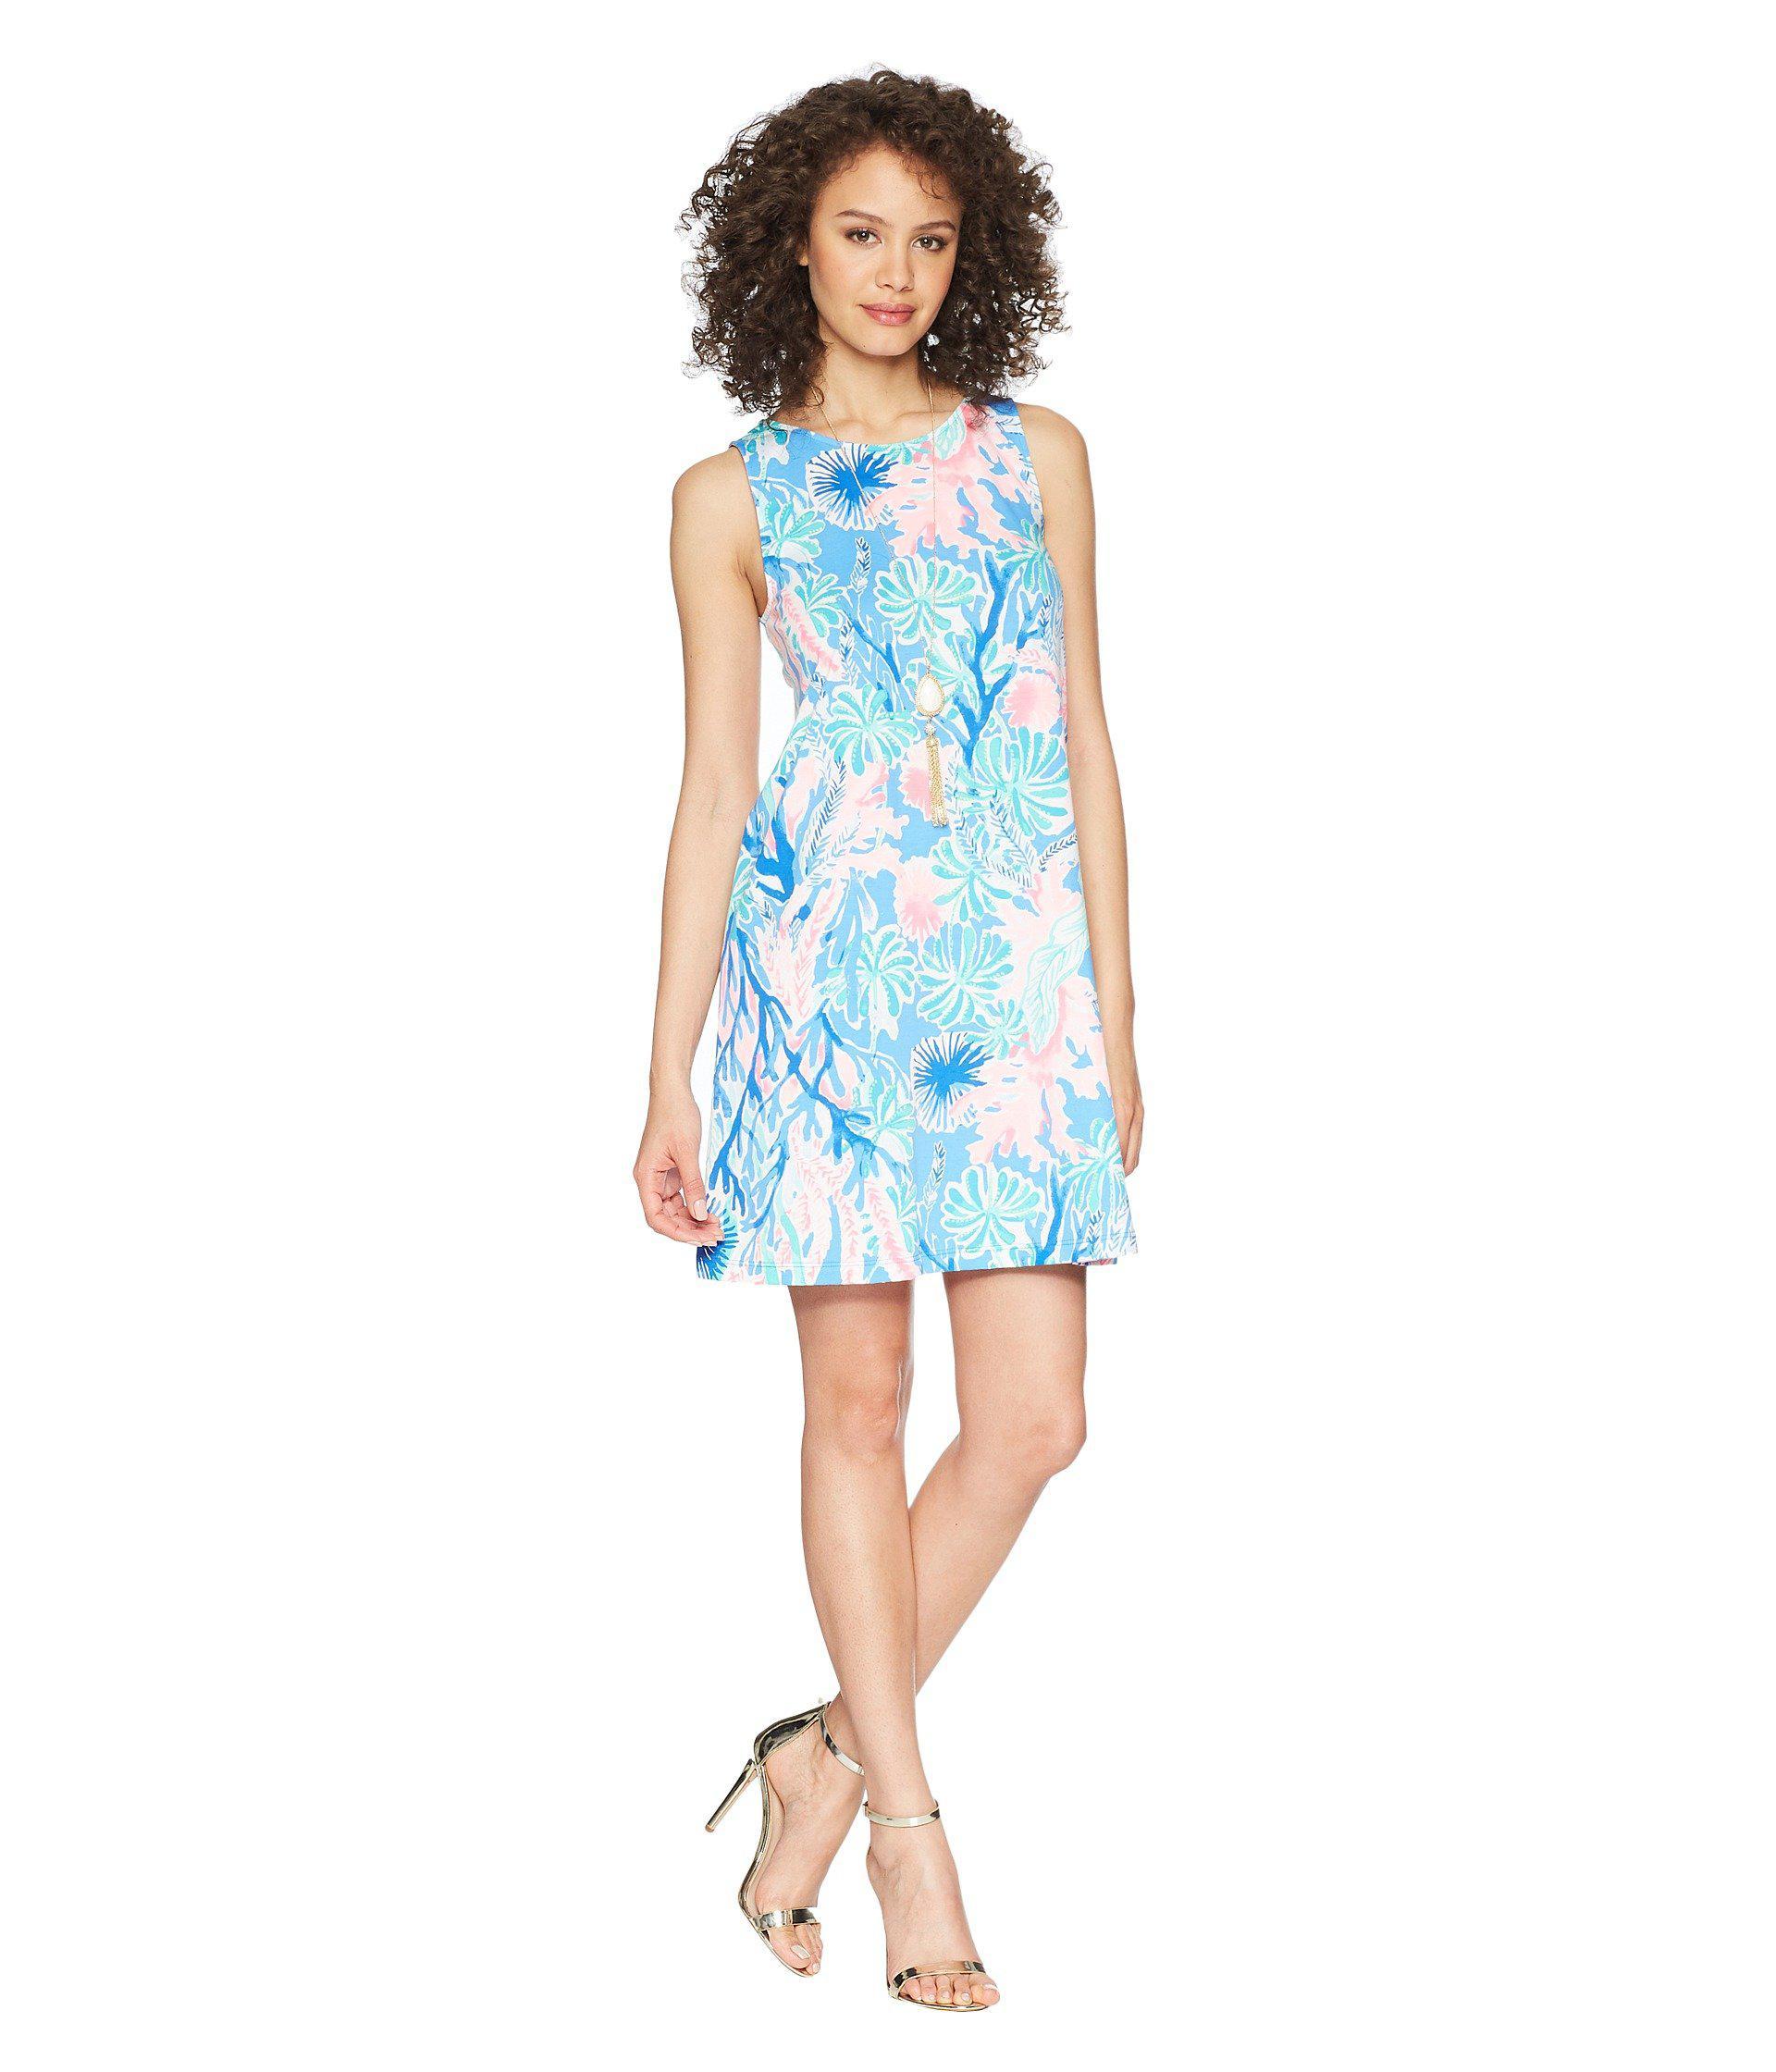 42bfc60755b Lilly Pulitzer Kristen Dress (multi Gumbo Limbo) Women's Dress in ...